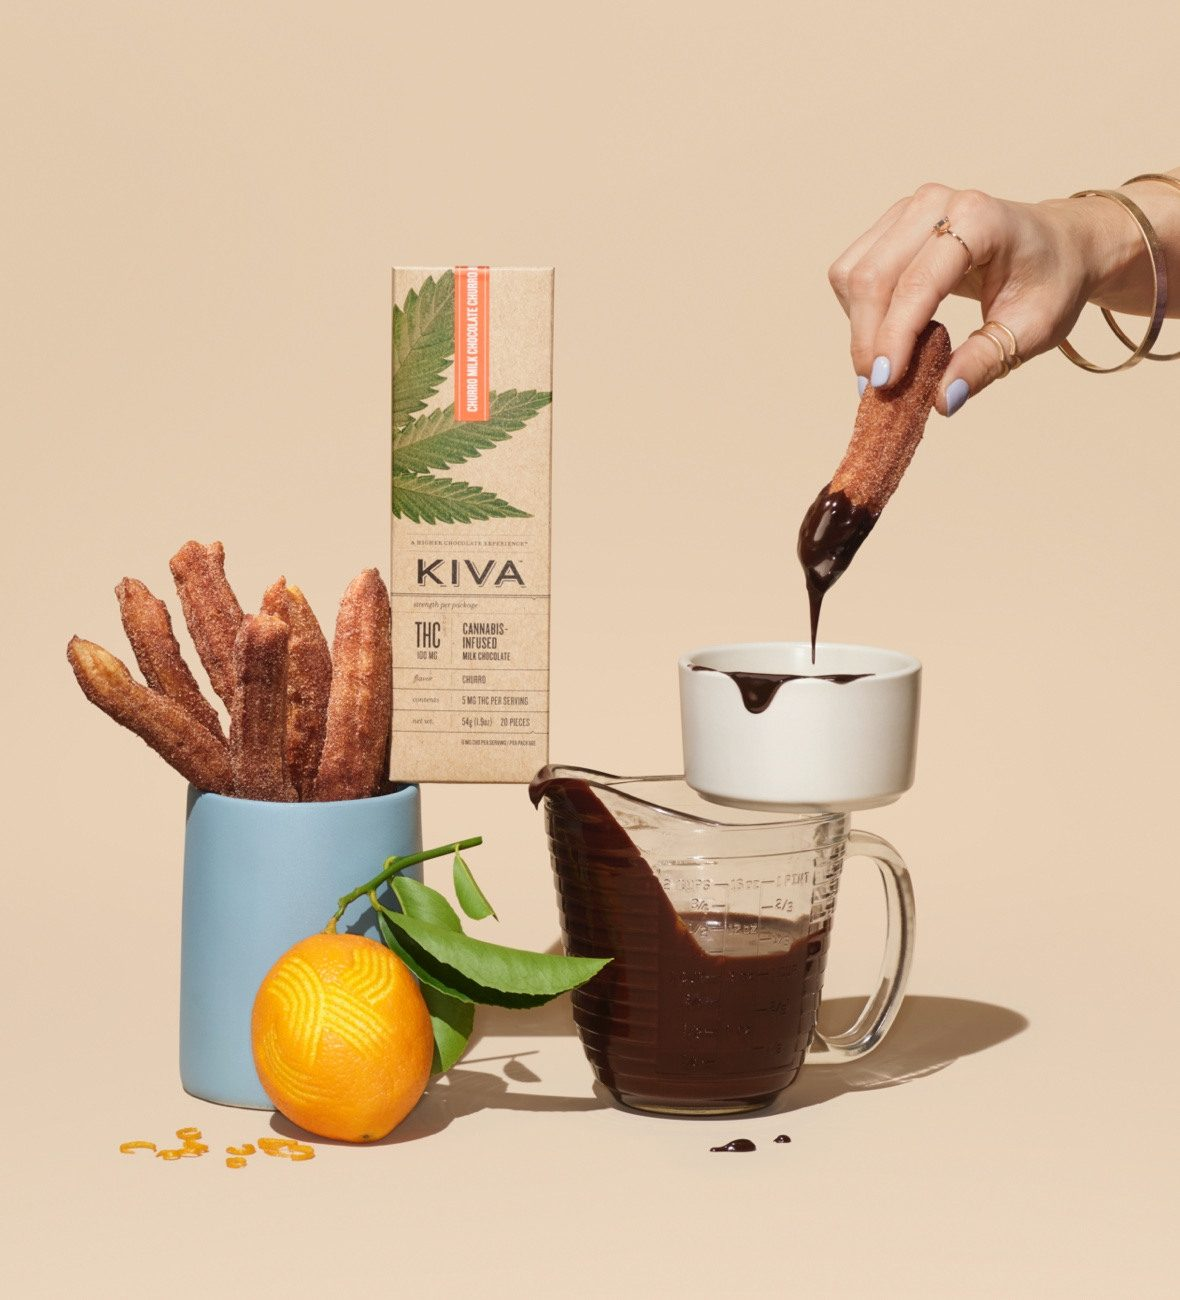 20191204 Blog Cinnamon Sugar Churros Kiva Caramel Dipping Sauce 1180x1300